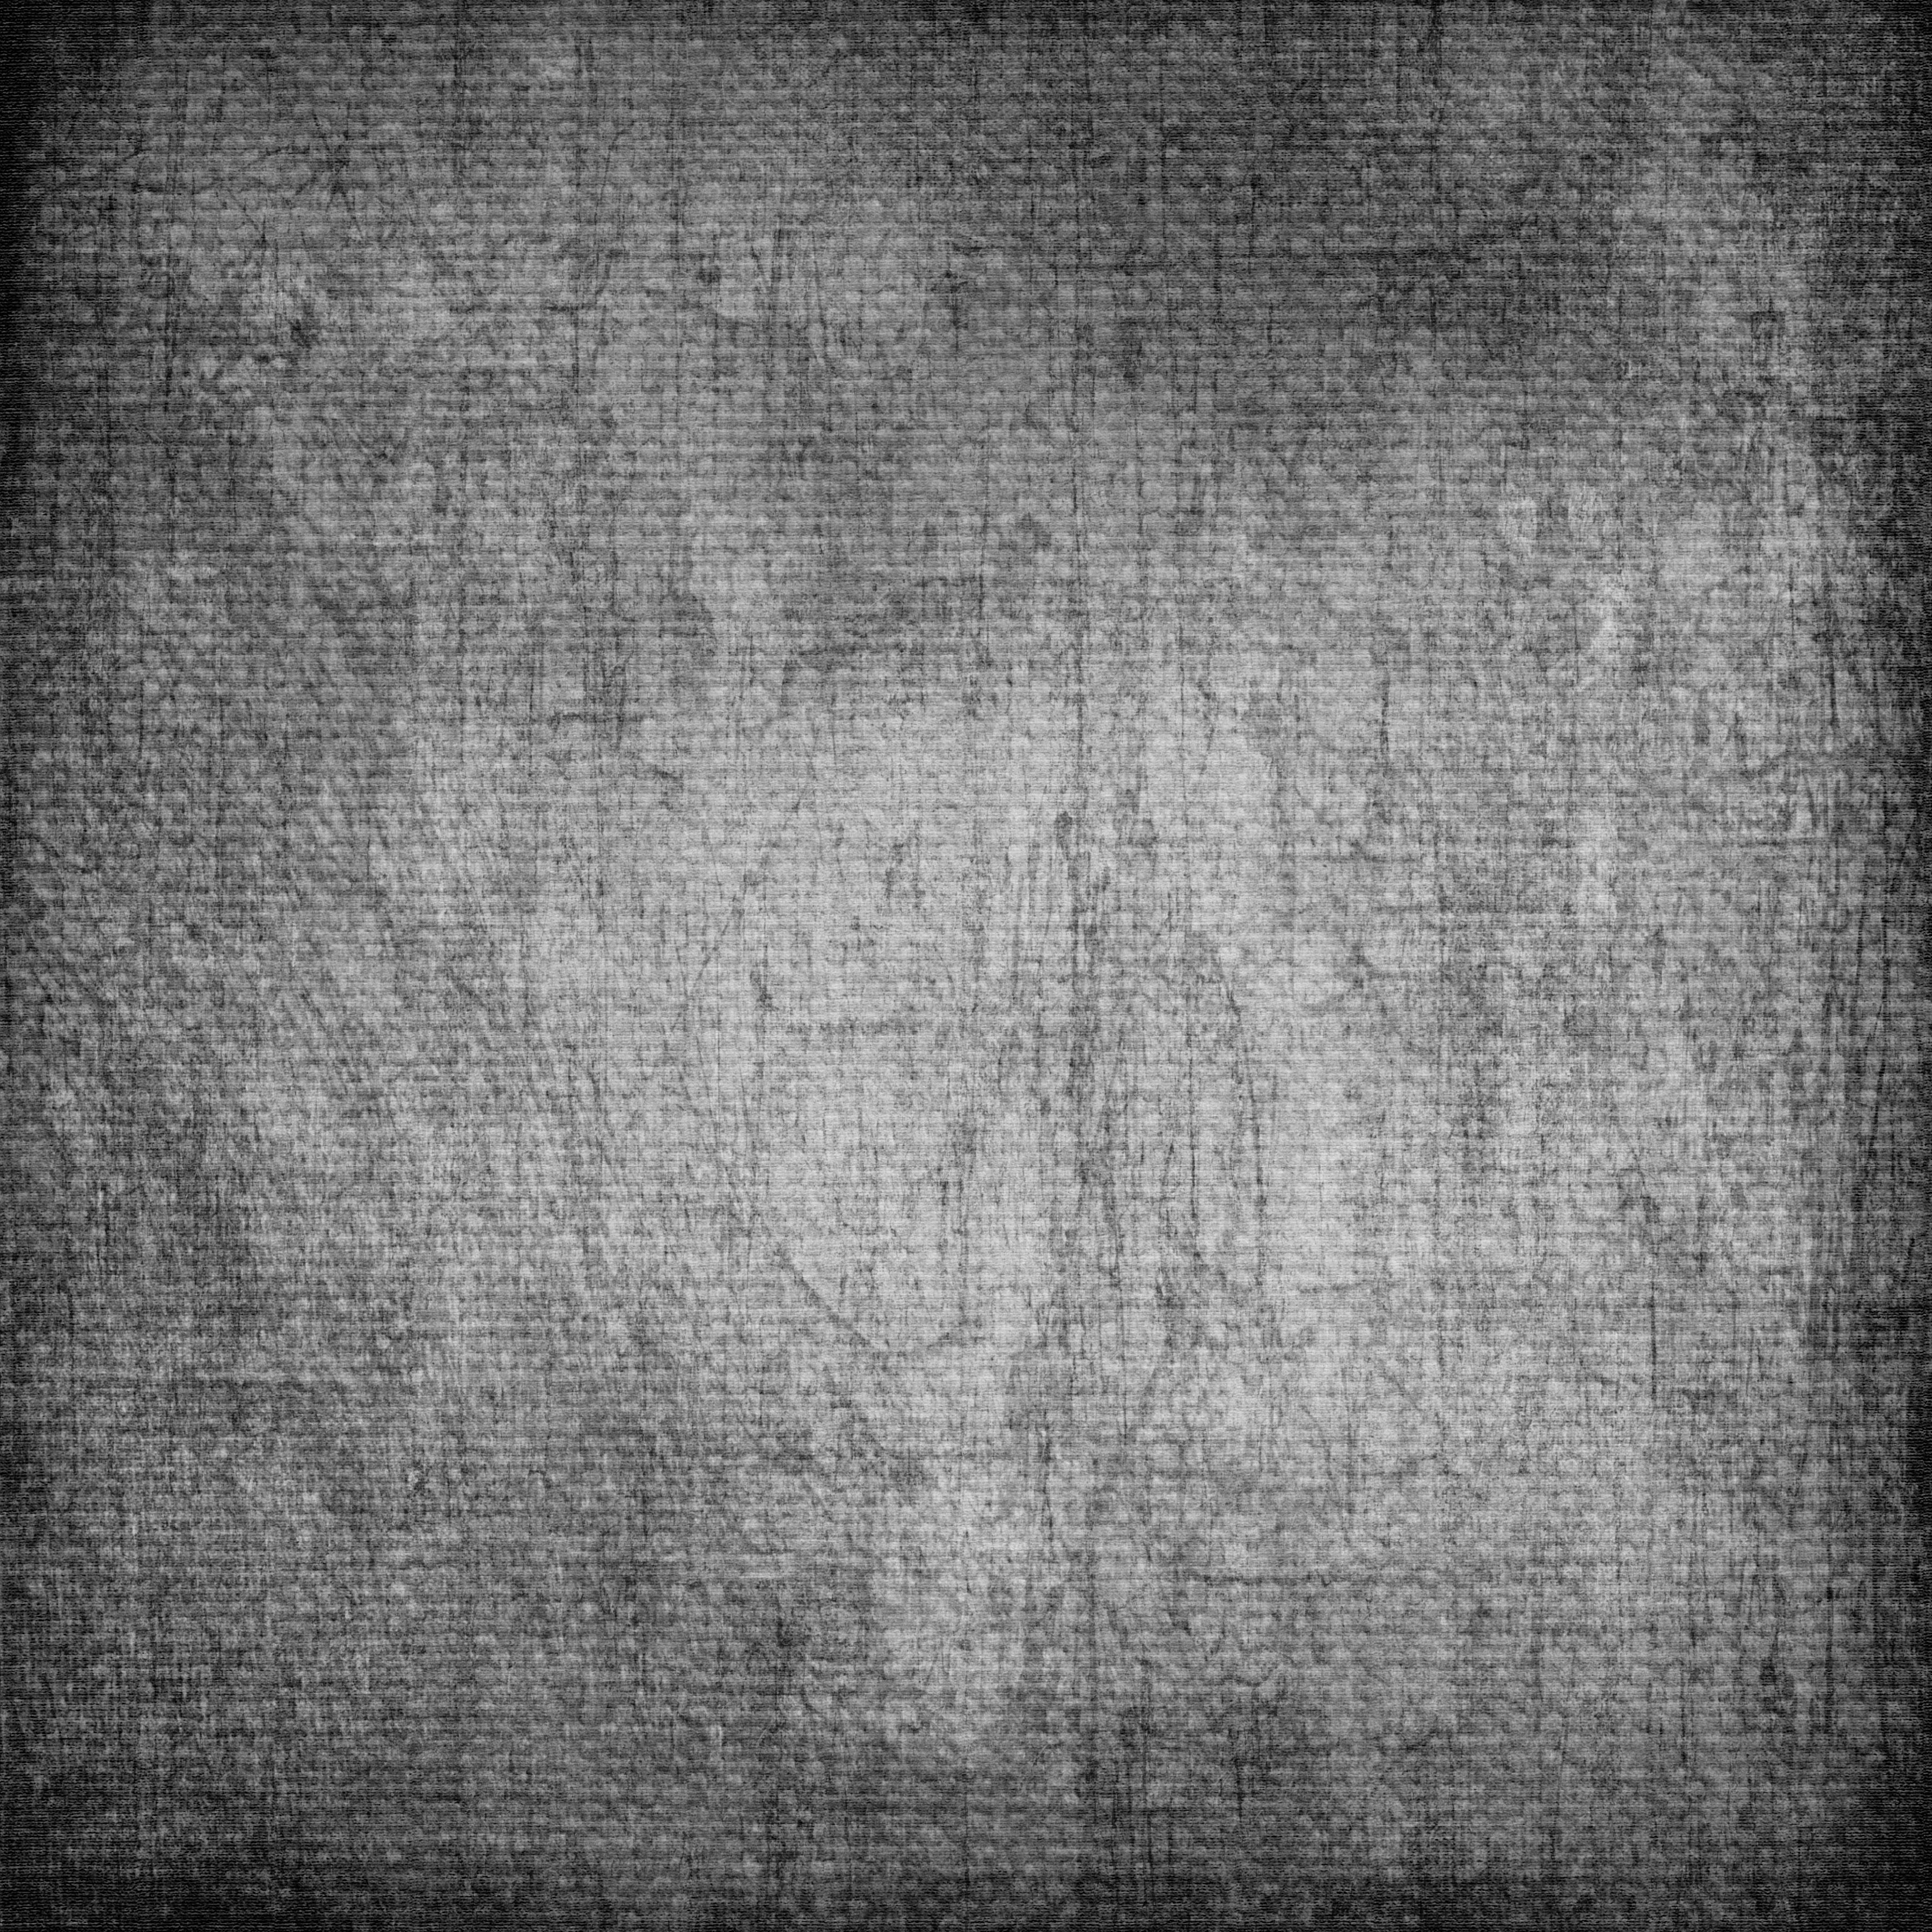 Grunge Texture Overlay 2 by HGGraphicDesigns on DeviantArt